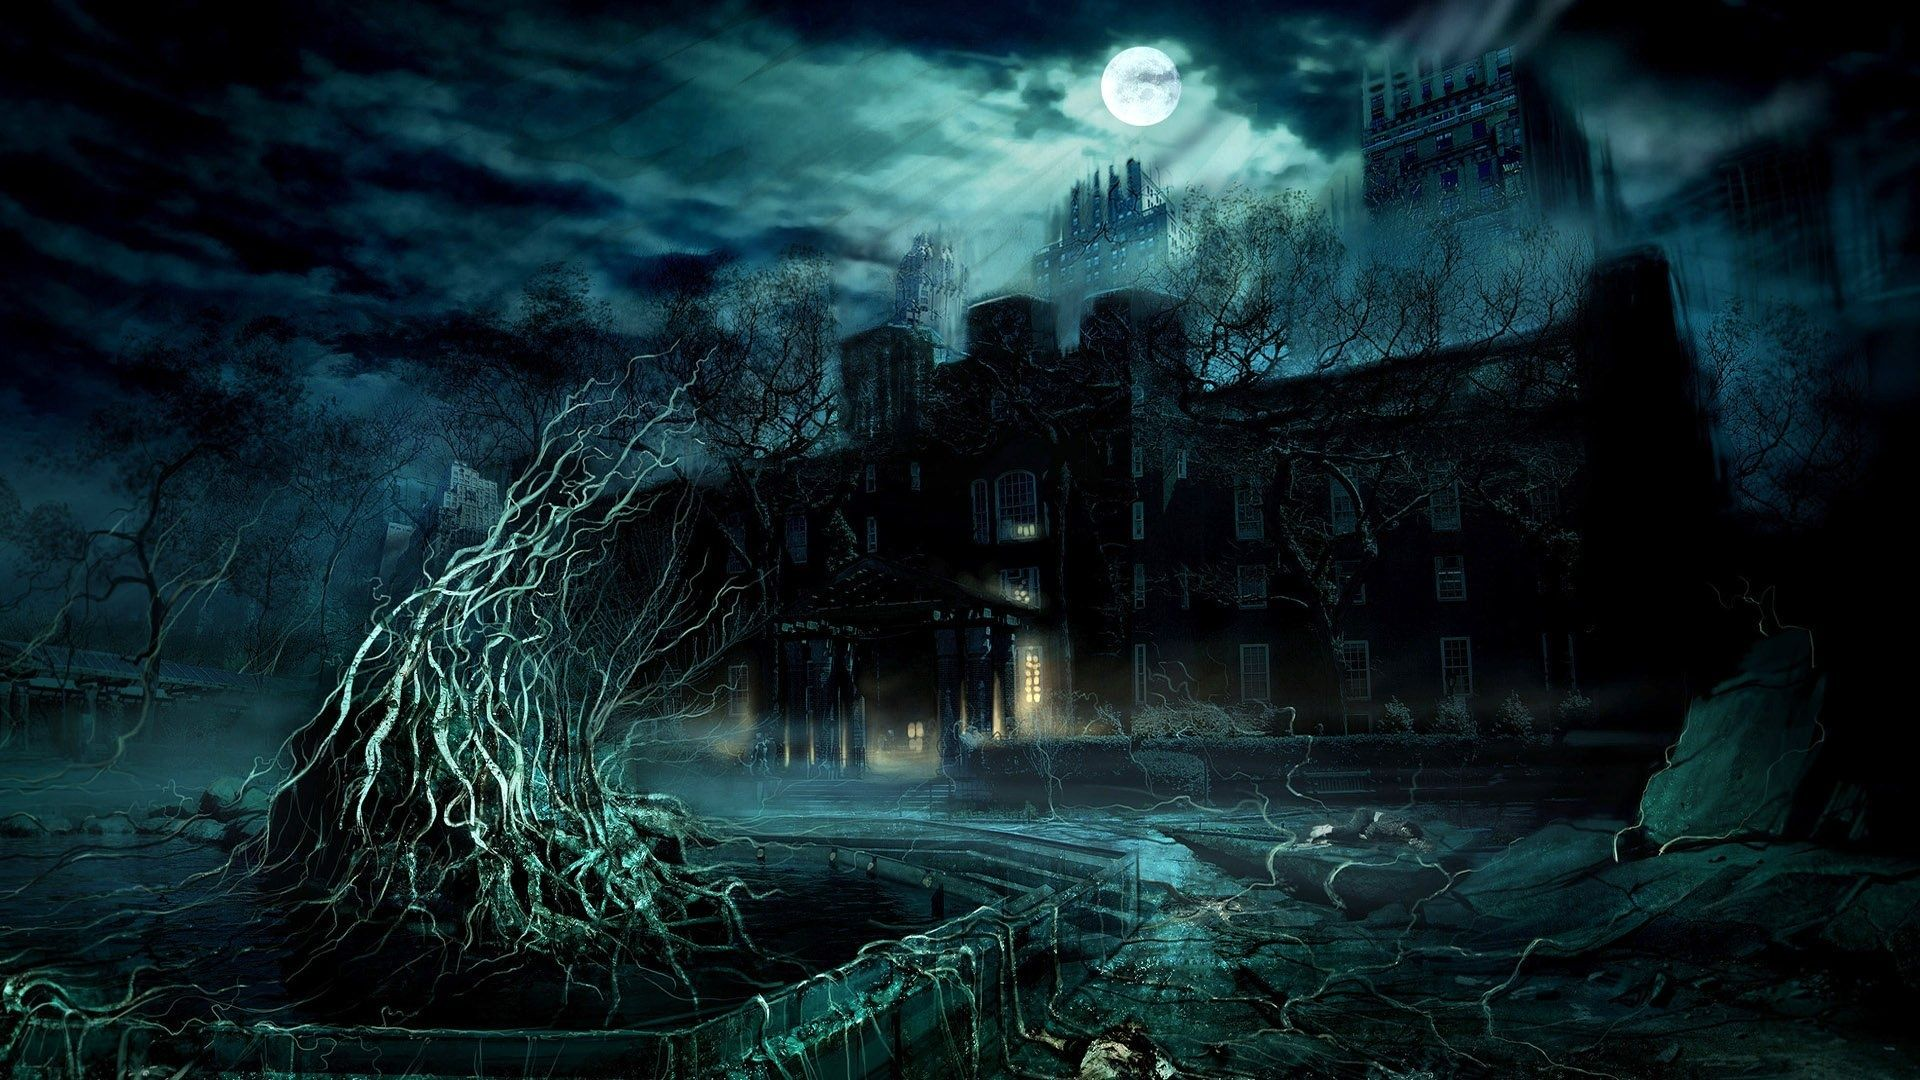 Dark Fantasy Bing Images Gothic Wallpaper Dark Wallpaper Alone In The Dark